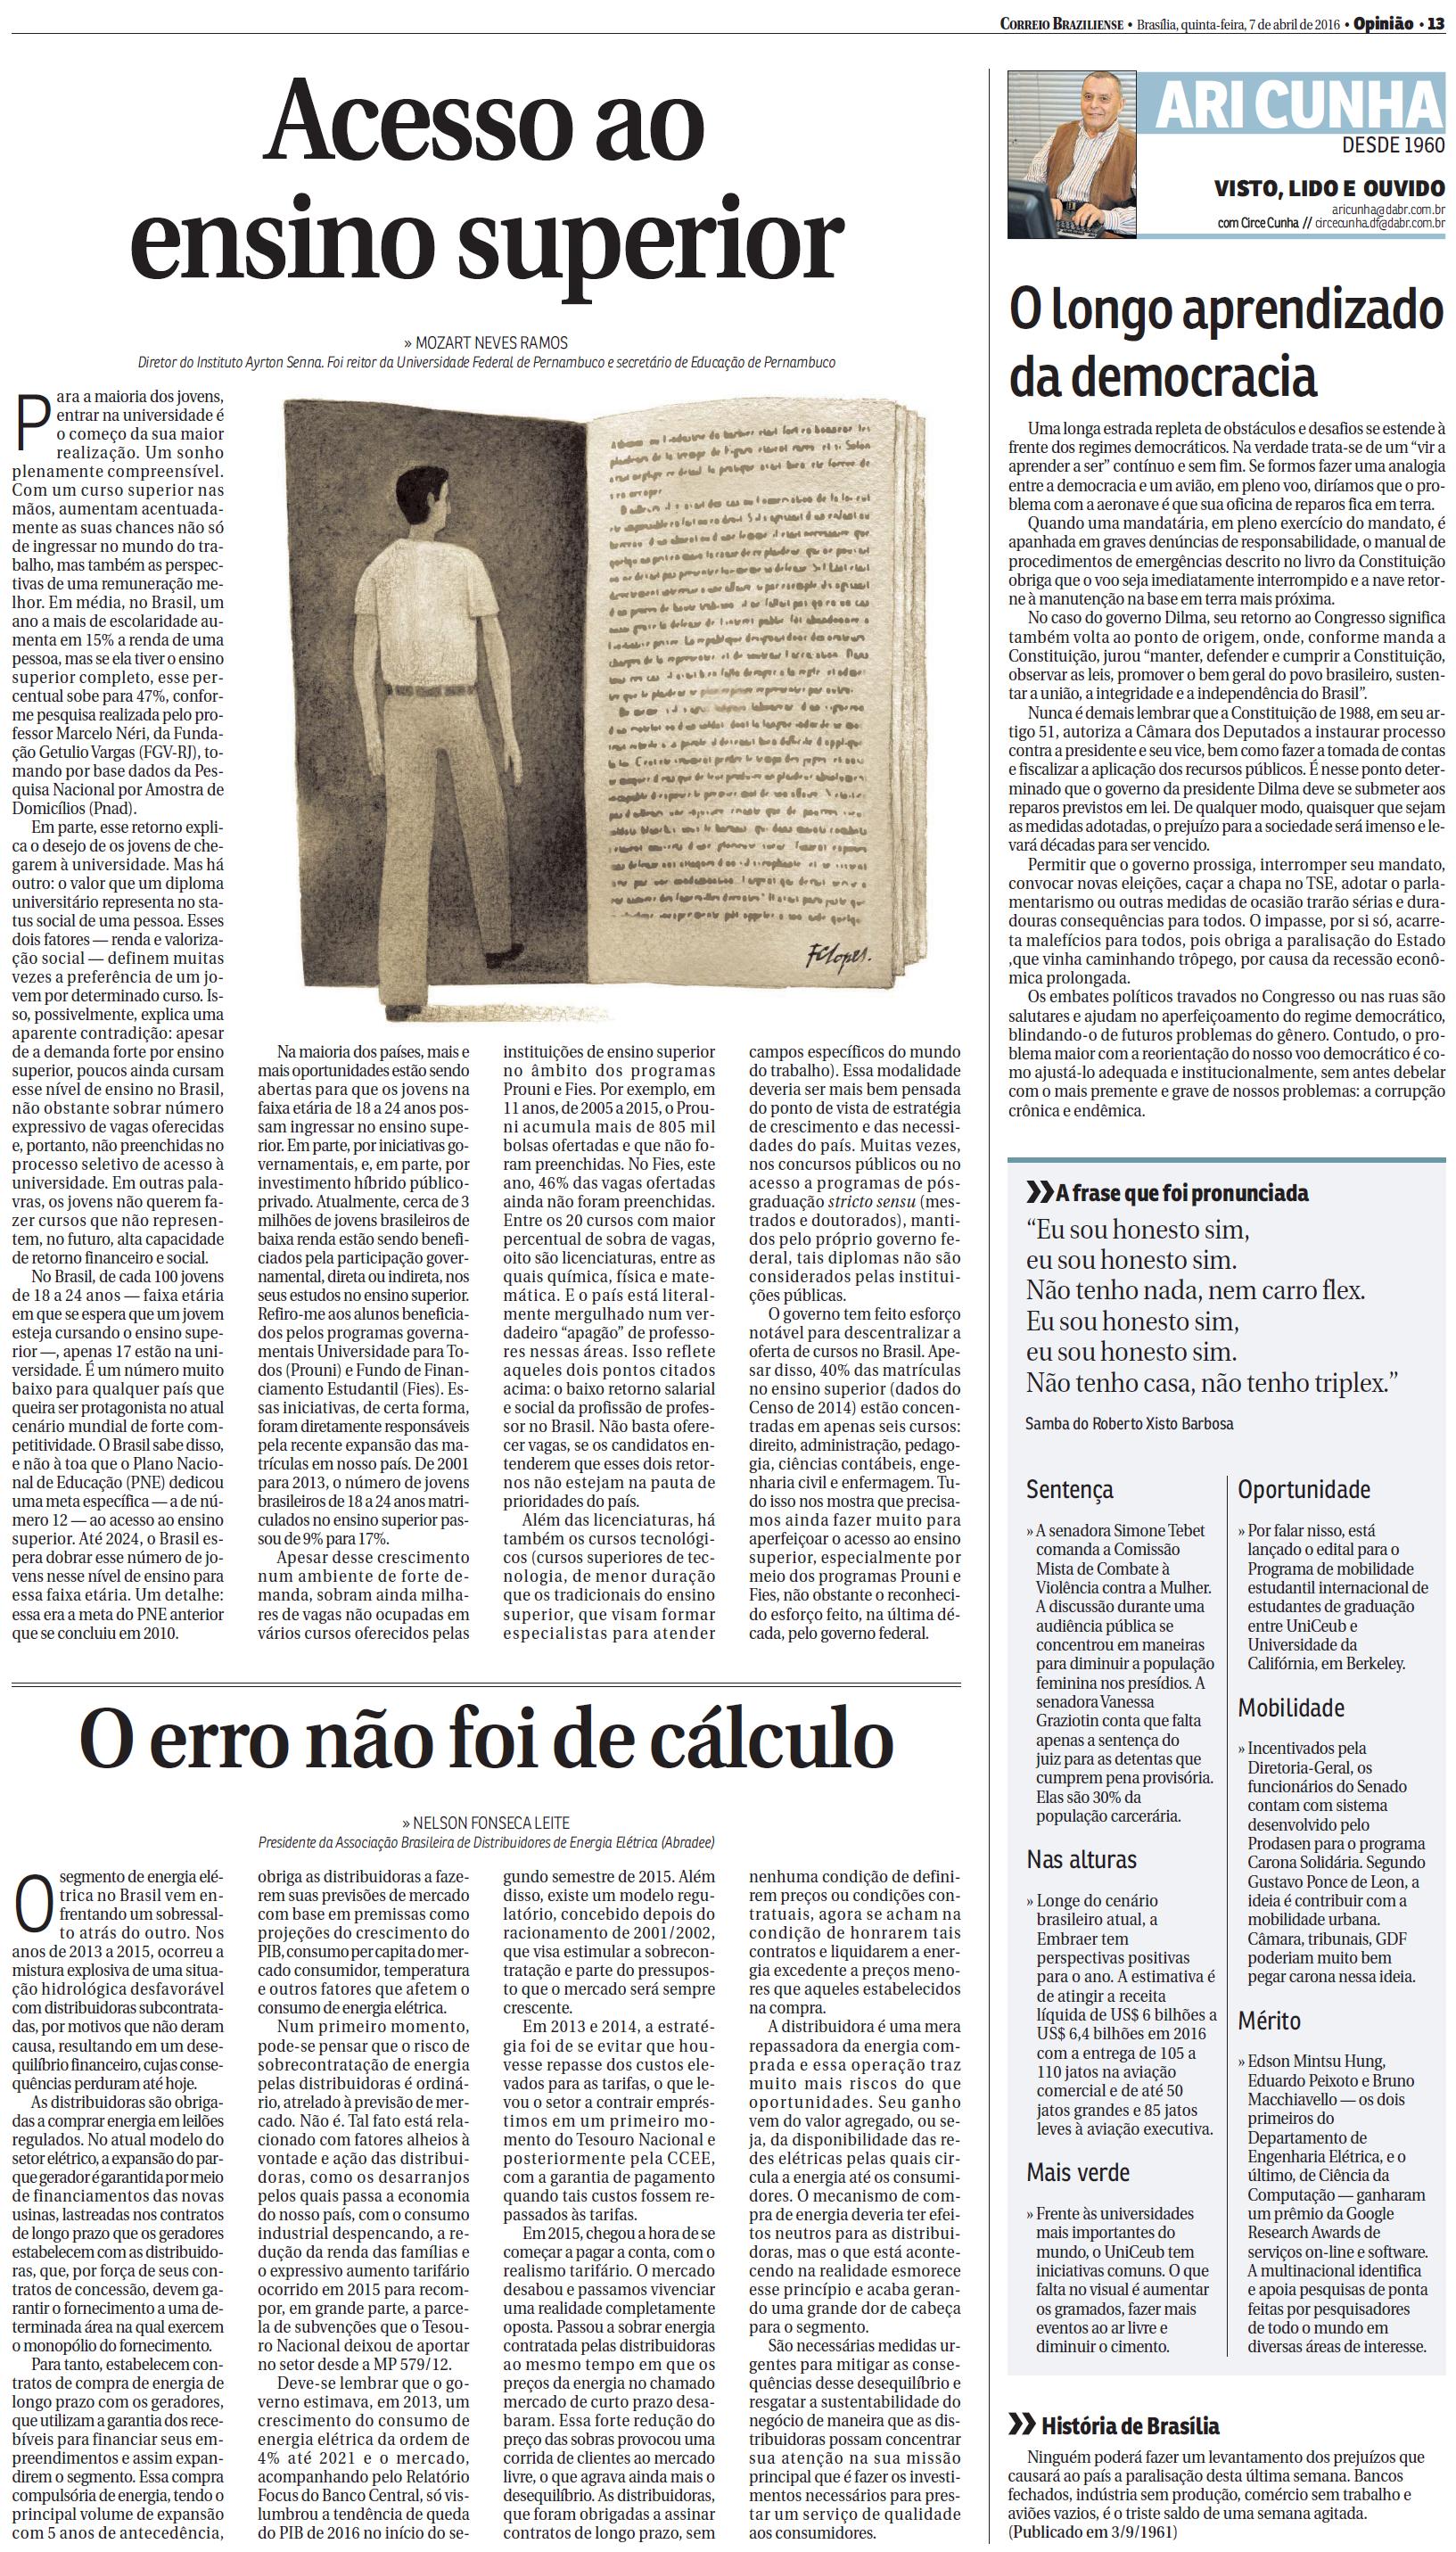 Abradee - correio Braziliense